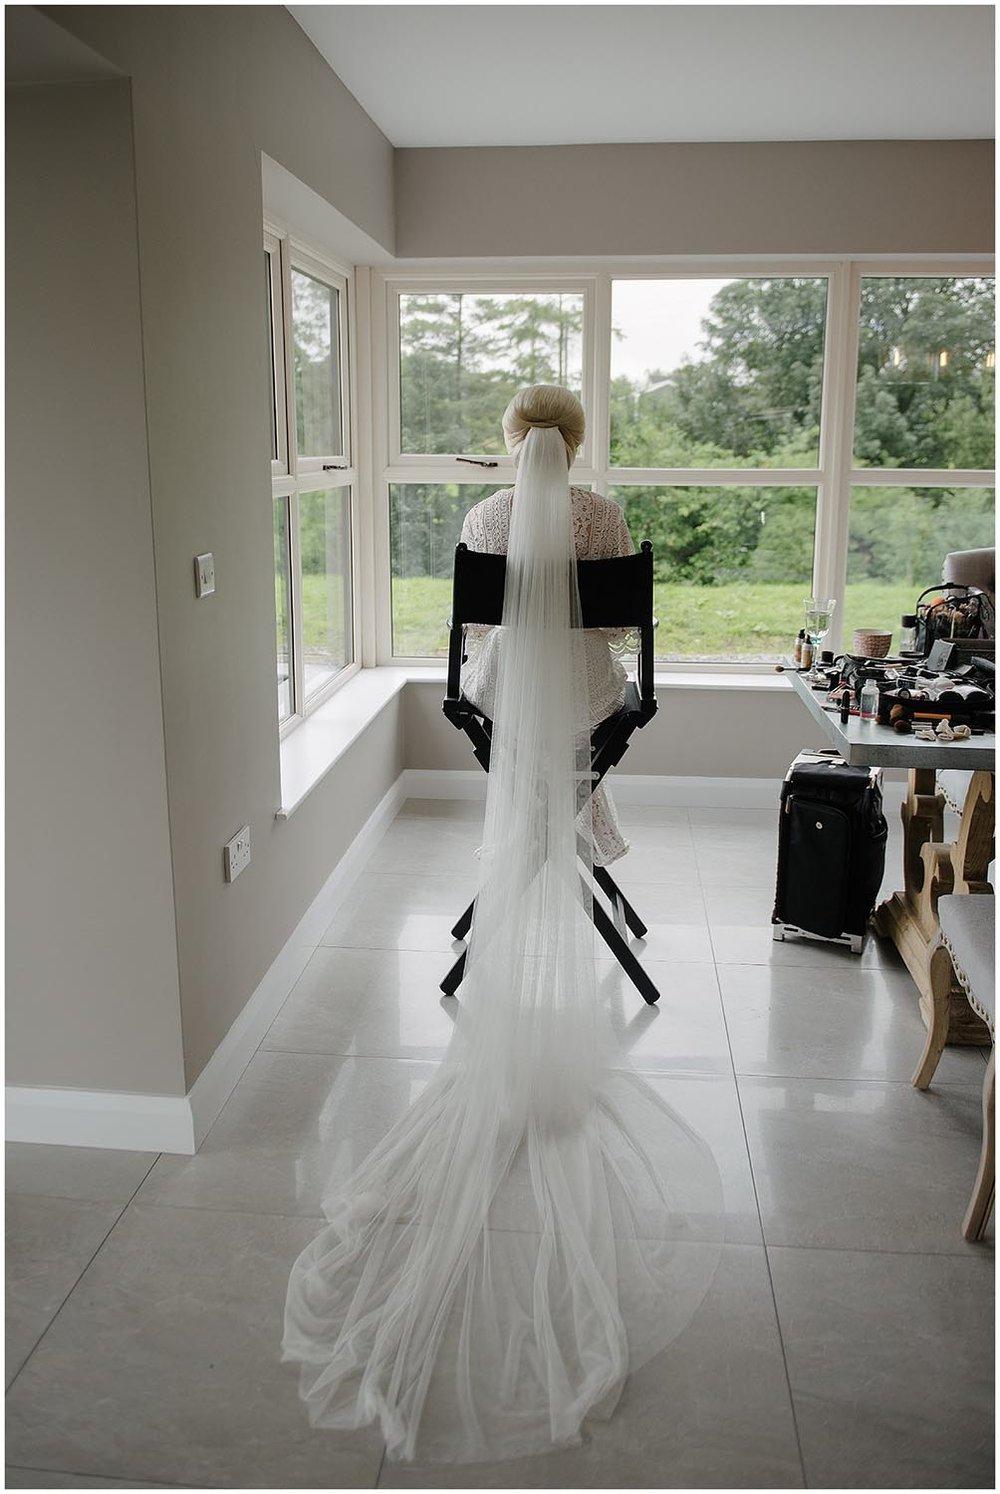 Irish-wedding-photographer-jude-browne-photography_0001.JPG